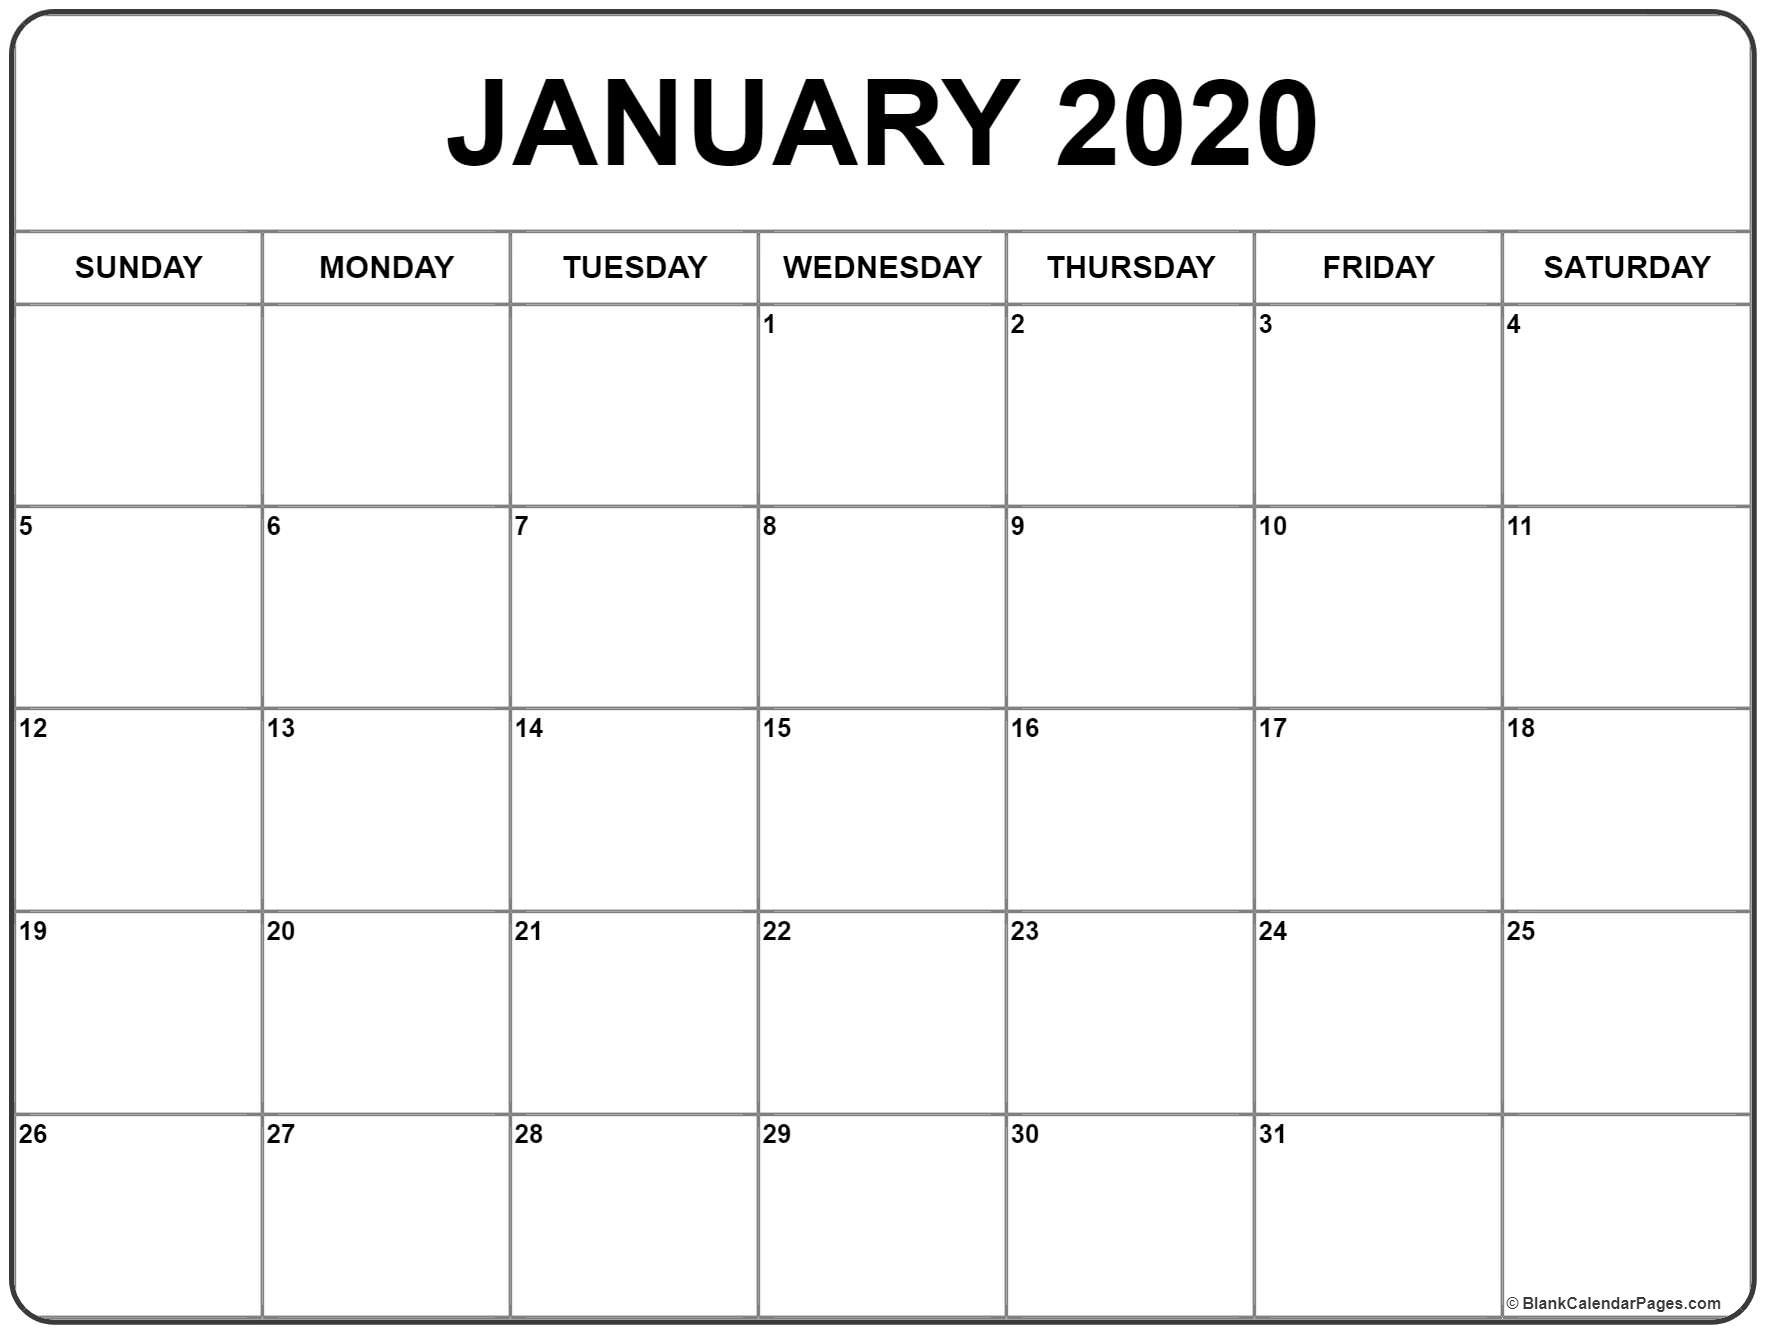 Free Printable Calendar 8.5 X 11 | Calendar Printables Calendar 8 X 11 Downloadable